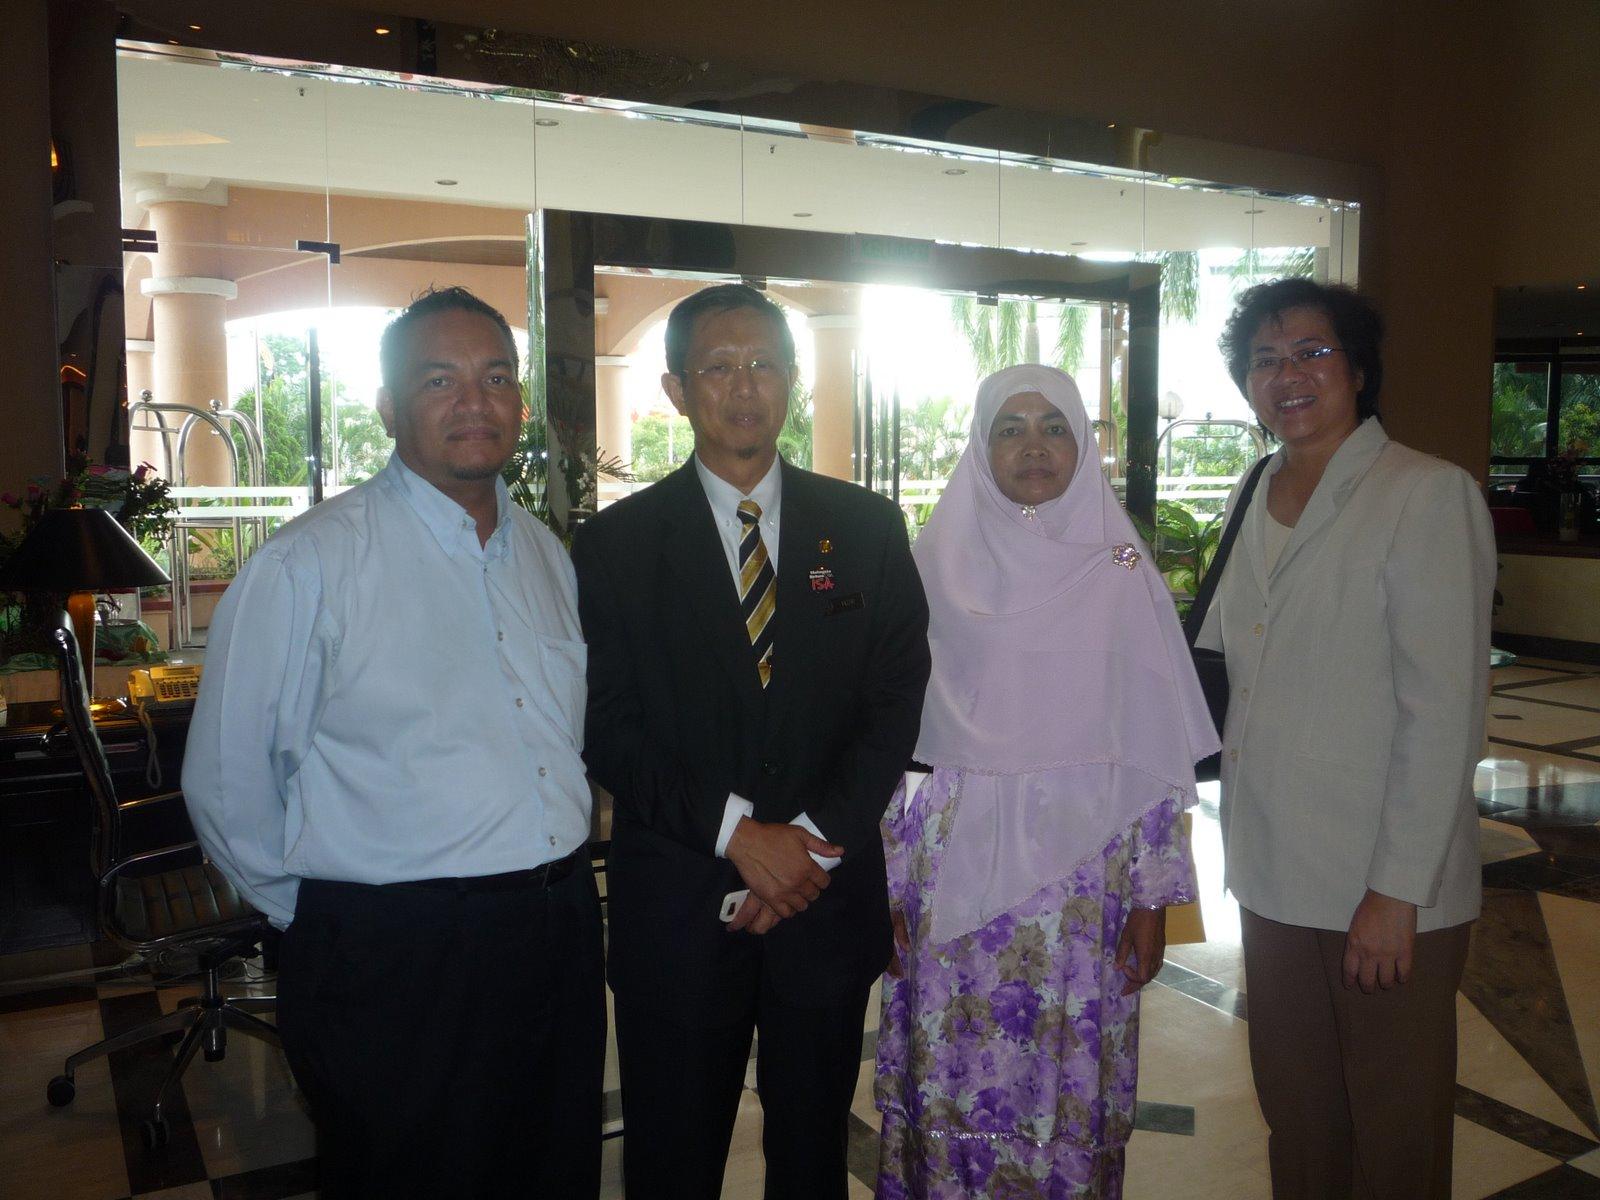 Bersama DS Nizar dan Datin -11 Mei 2009